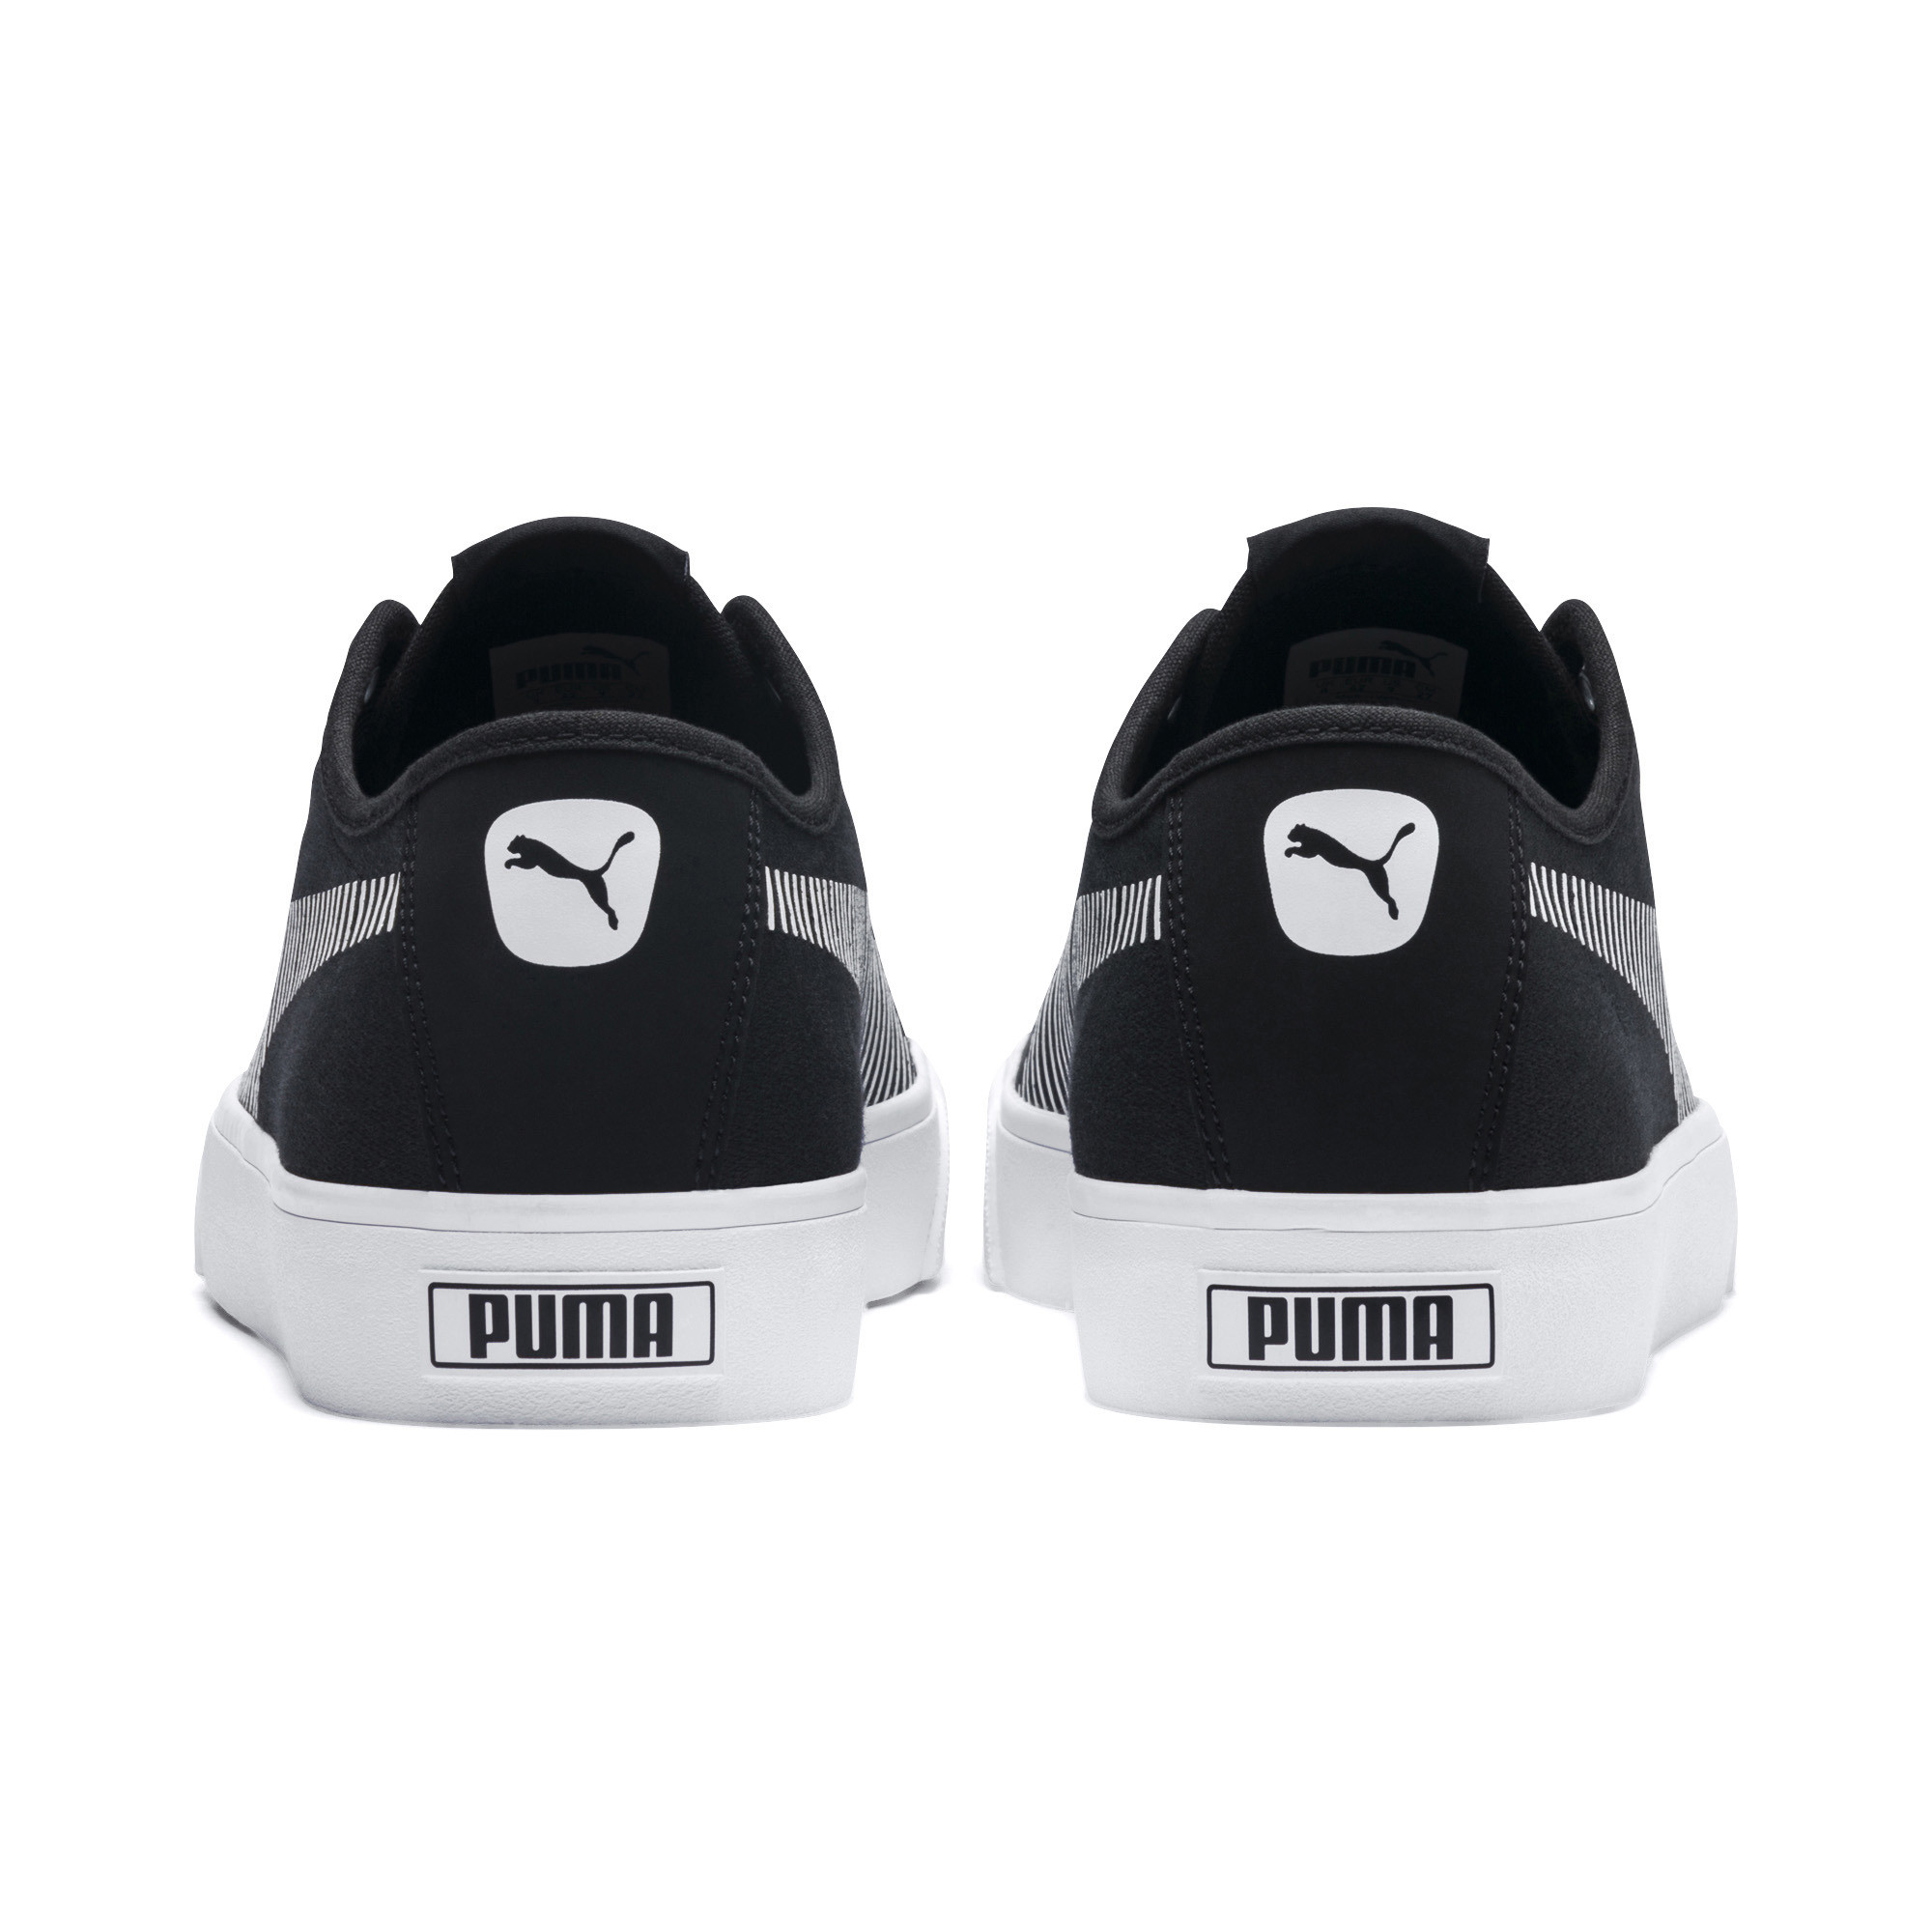 PUMA-Bari-Sneakers-Men-Shoe-Basics thumbnail 3